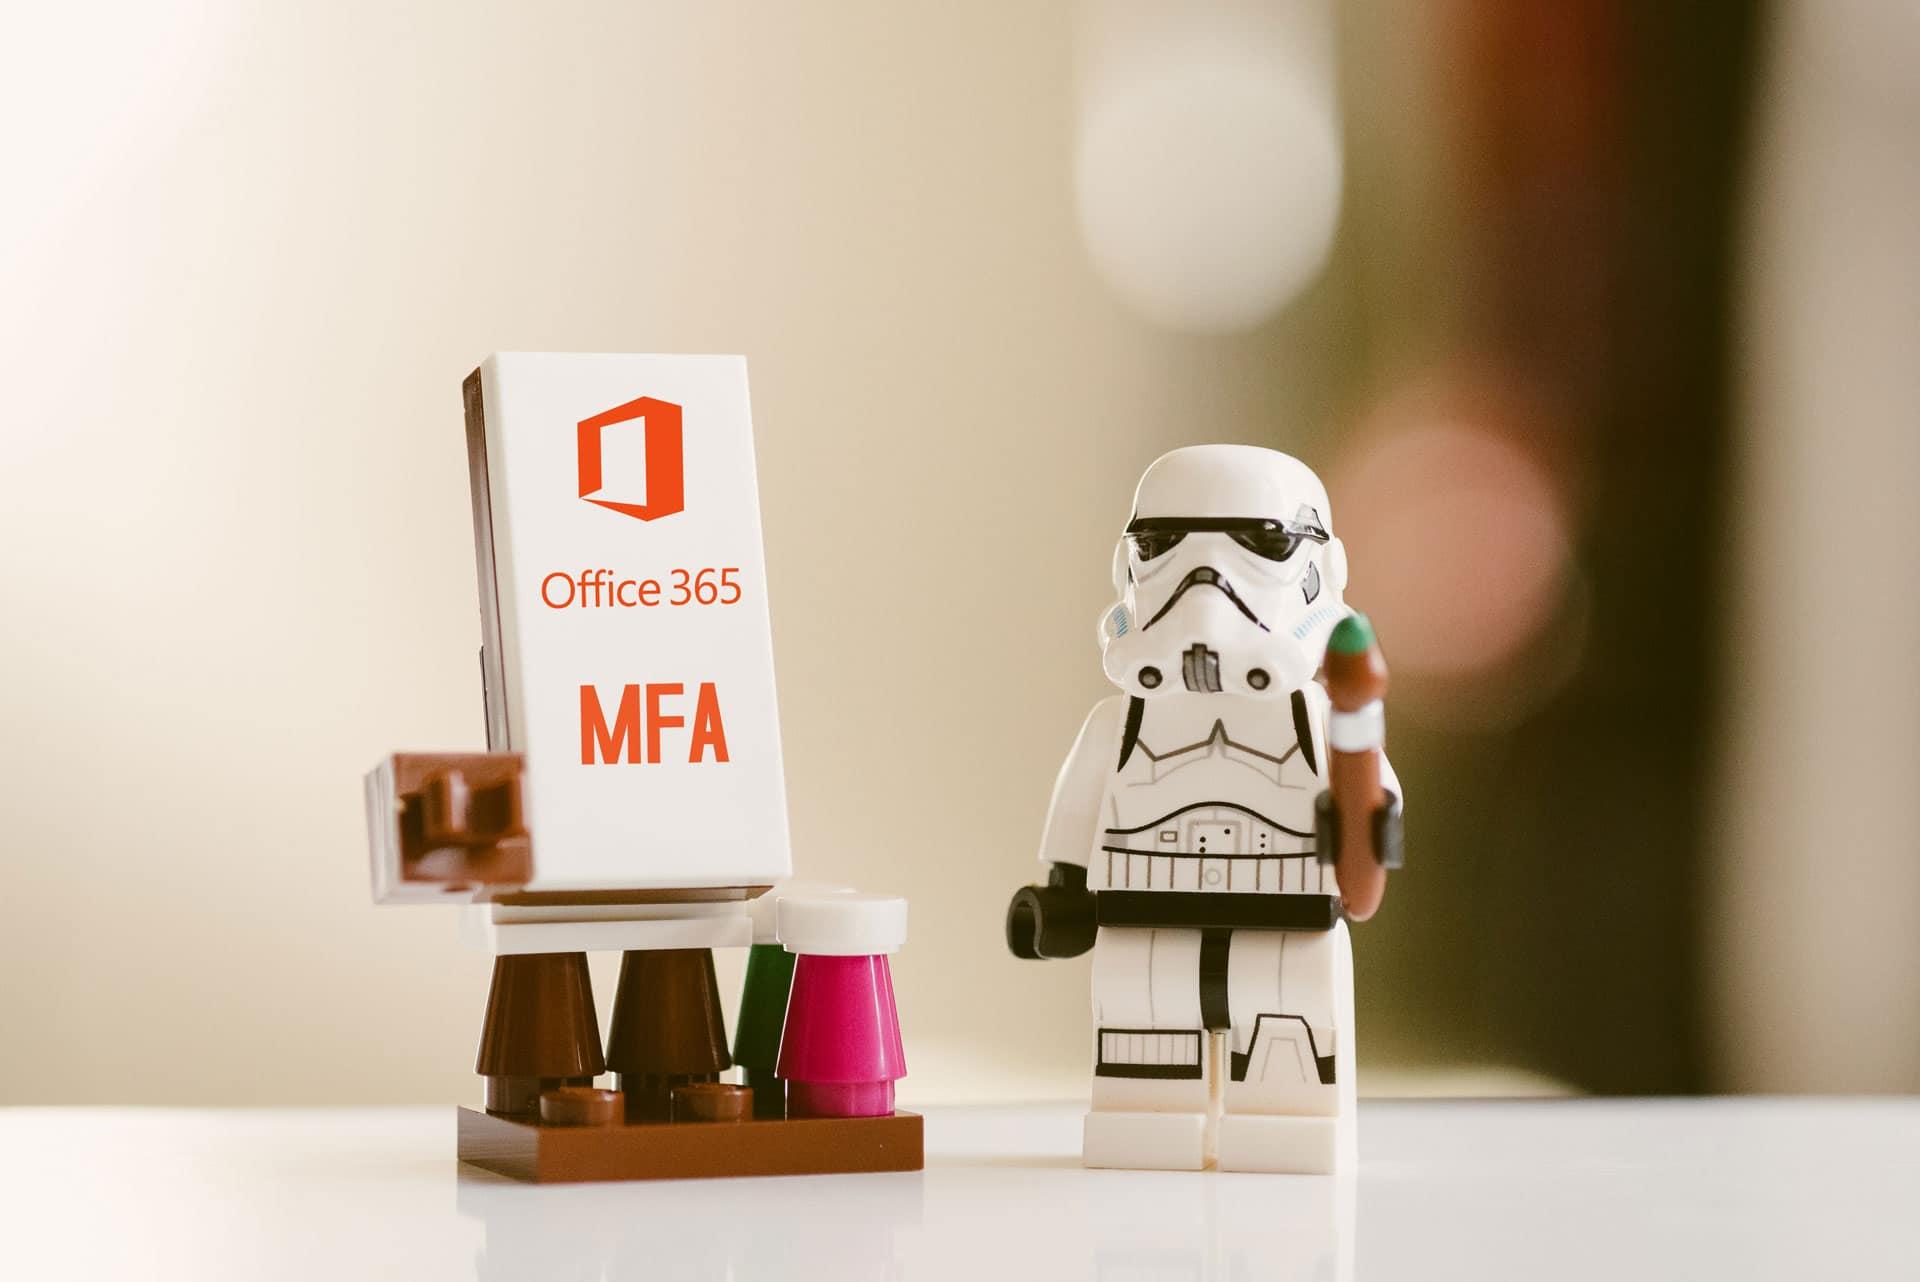 352 Digital Office 365 MFA